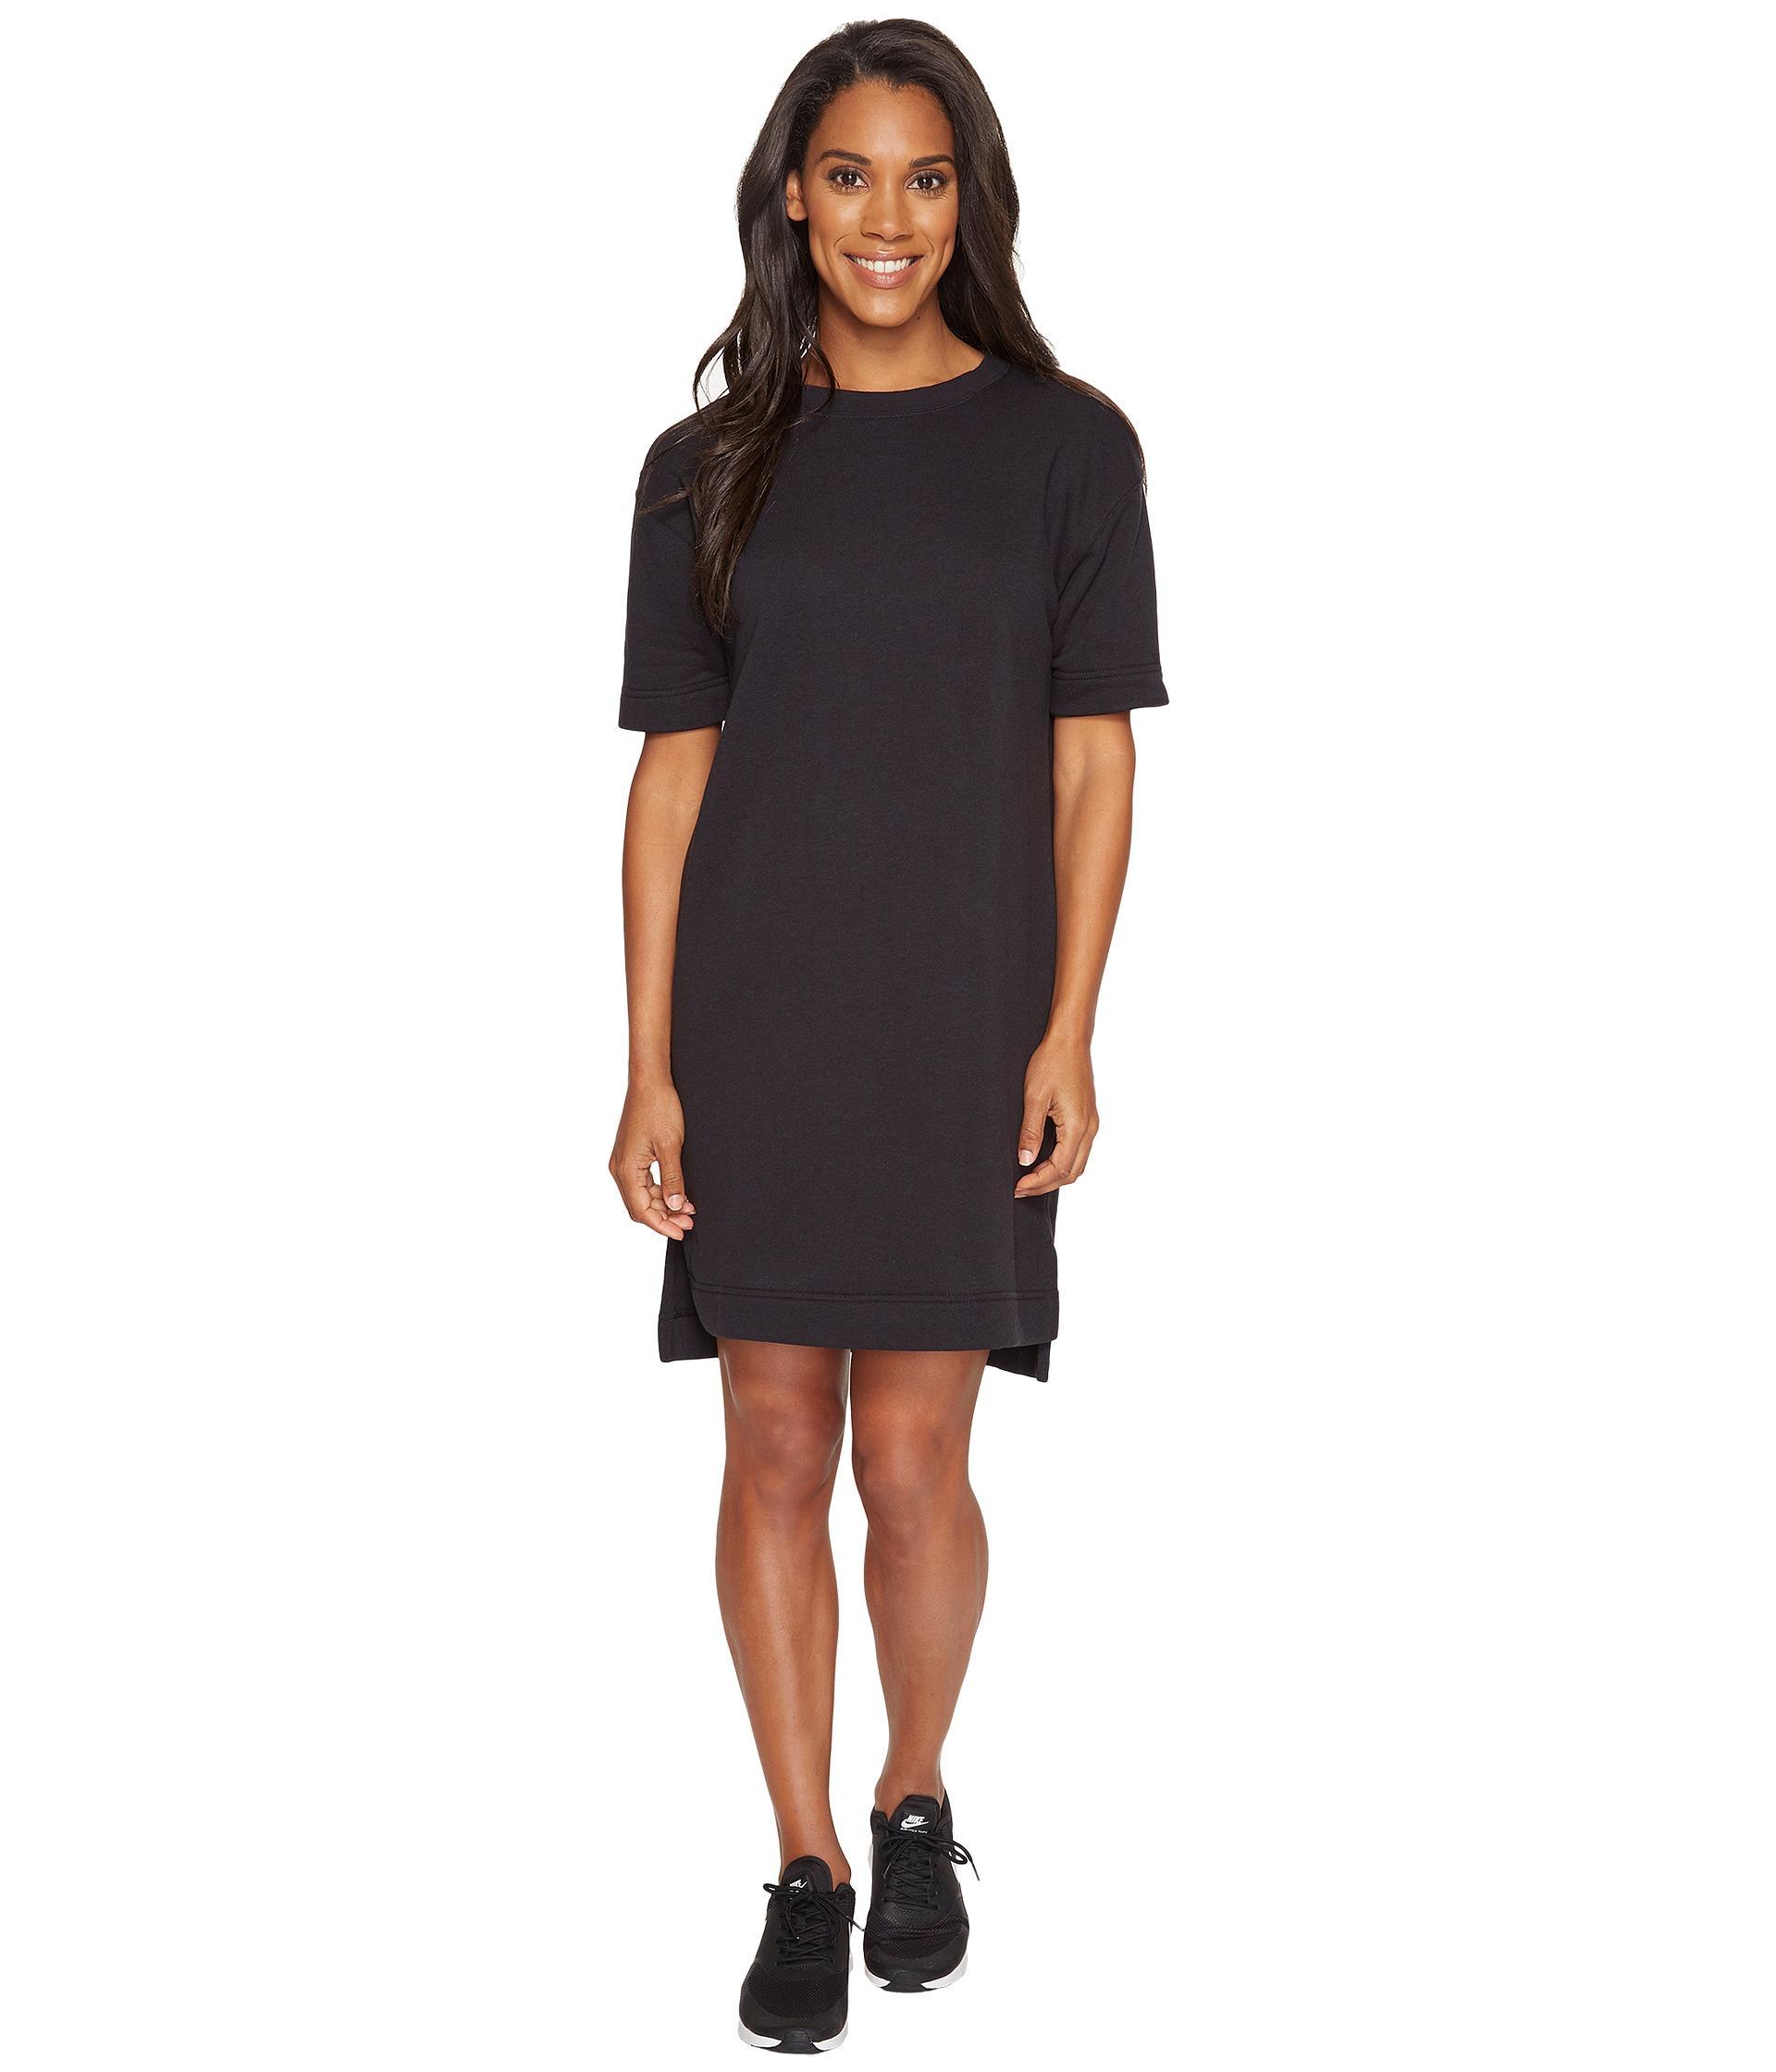 Black modern dress - Nike Black Sportswear Modern Dress Lyst View Fullscreen